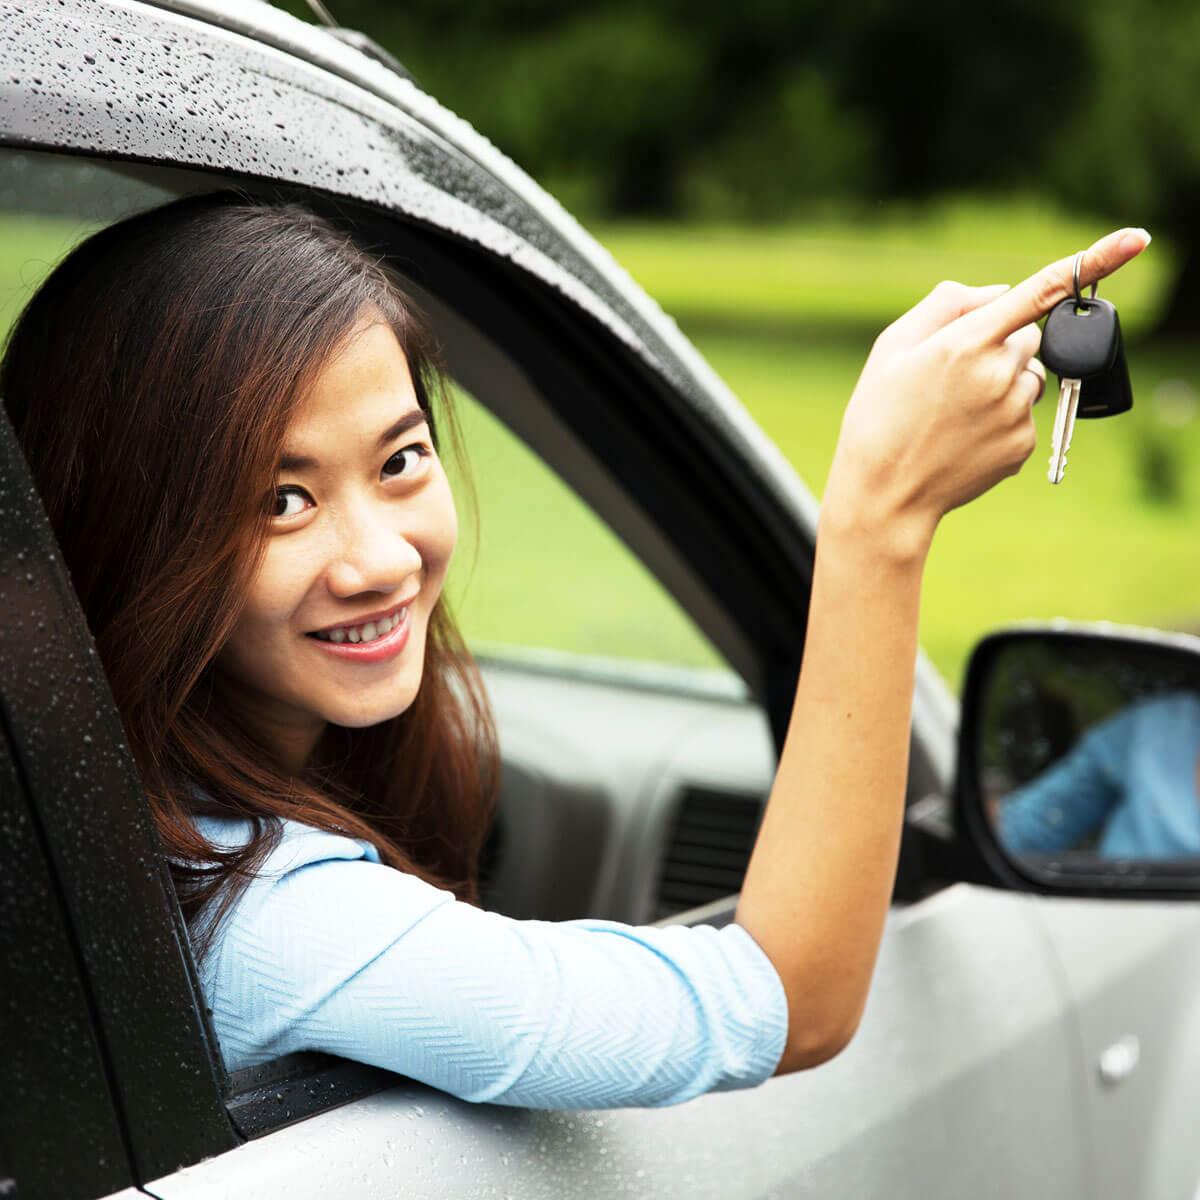 Asia Carz Short Term Car Rental Profile